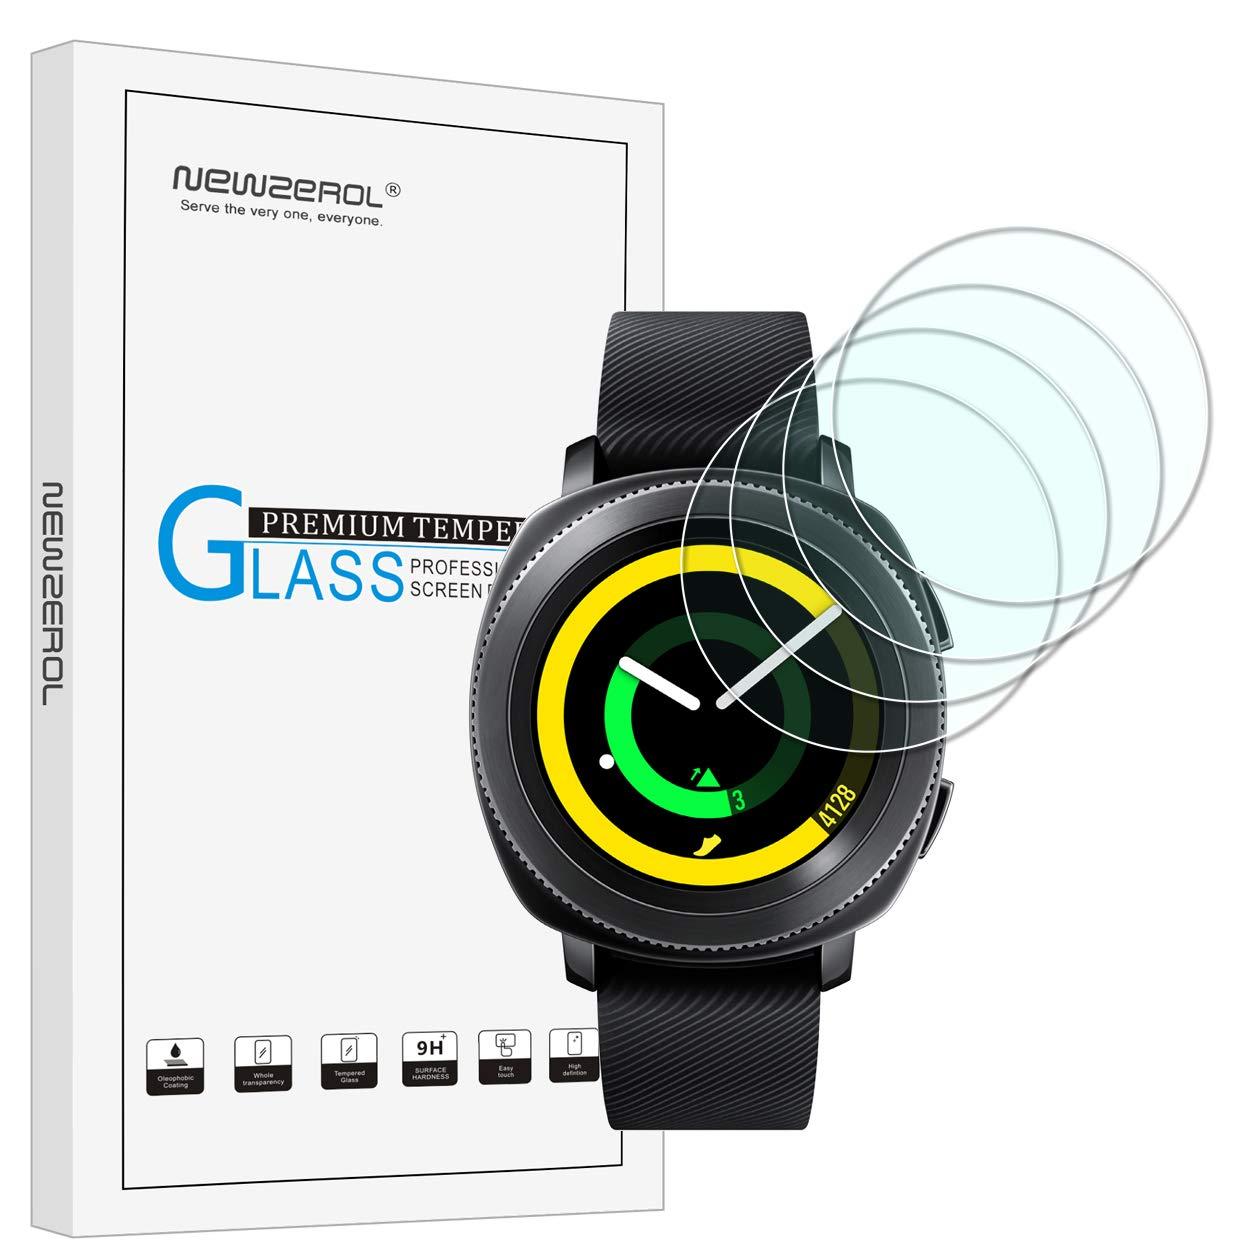 Garmin v/ívosport Screen Protector Glass 2-PACK Maxhood 9H Hardness 0.3mm Ultra-Thin 2.5D Round Edge Tempered Glass Screen Protector for Garmin v/ívosport